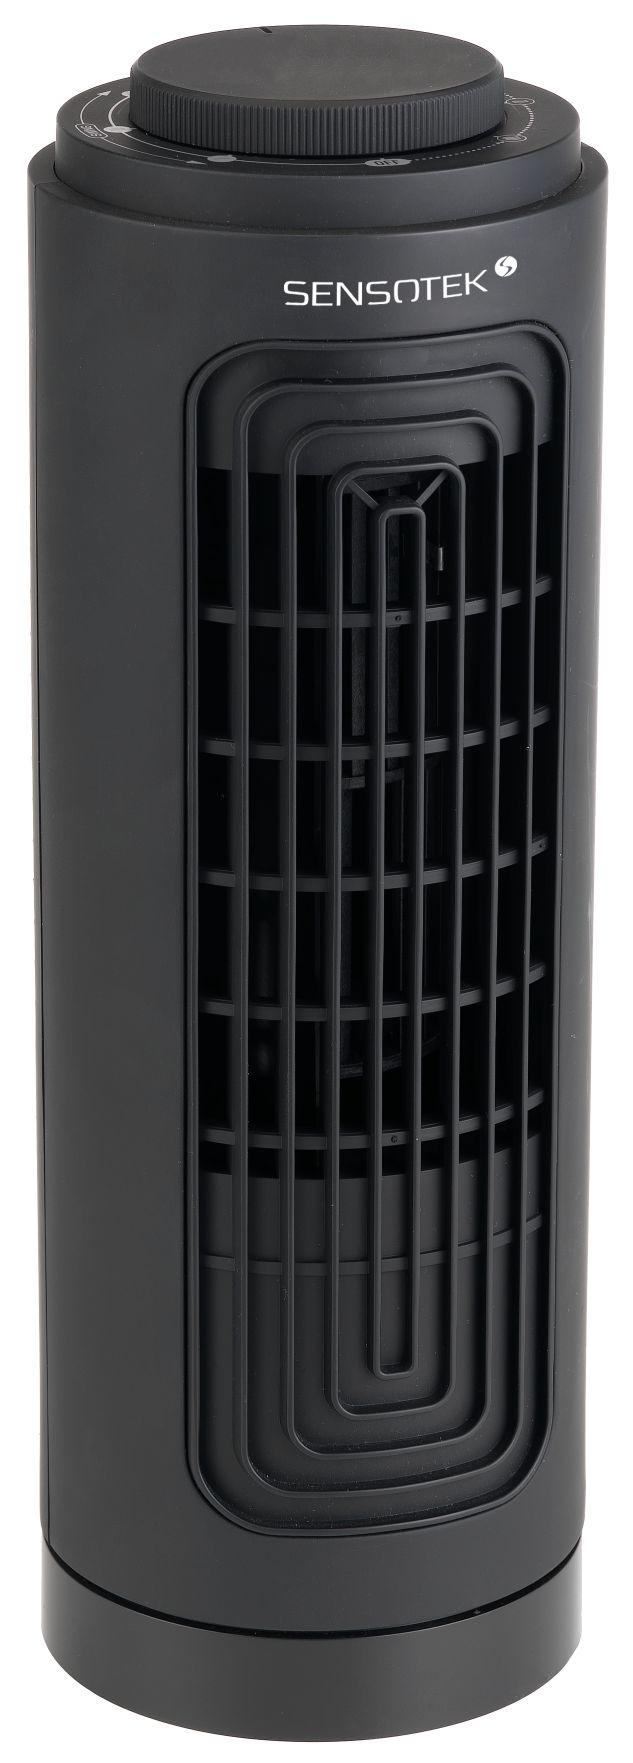 Sensotek ST200 Tower Fan bordventilator